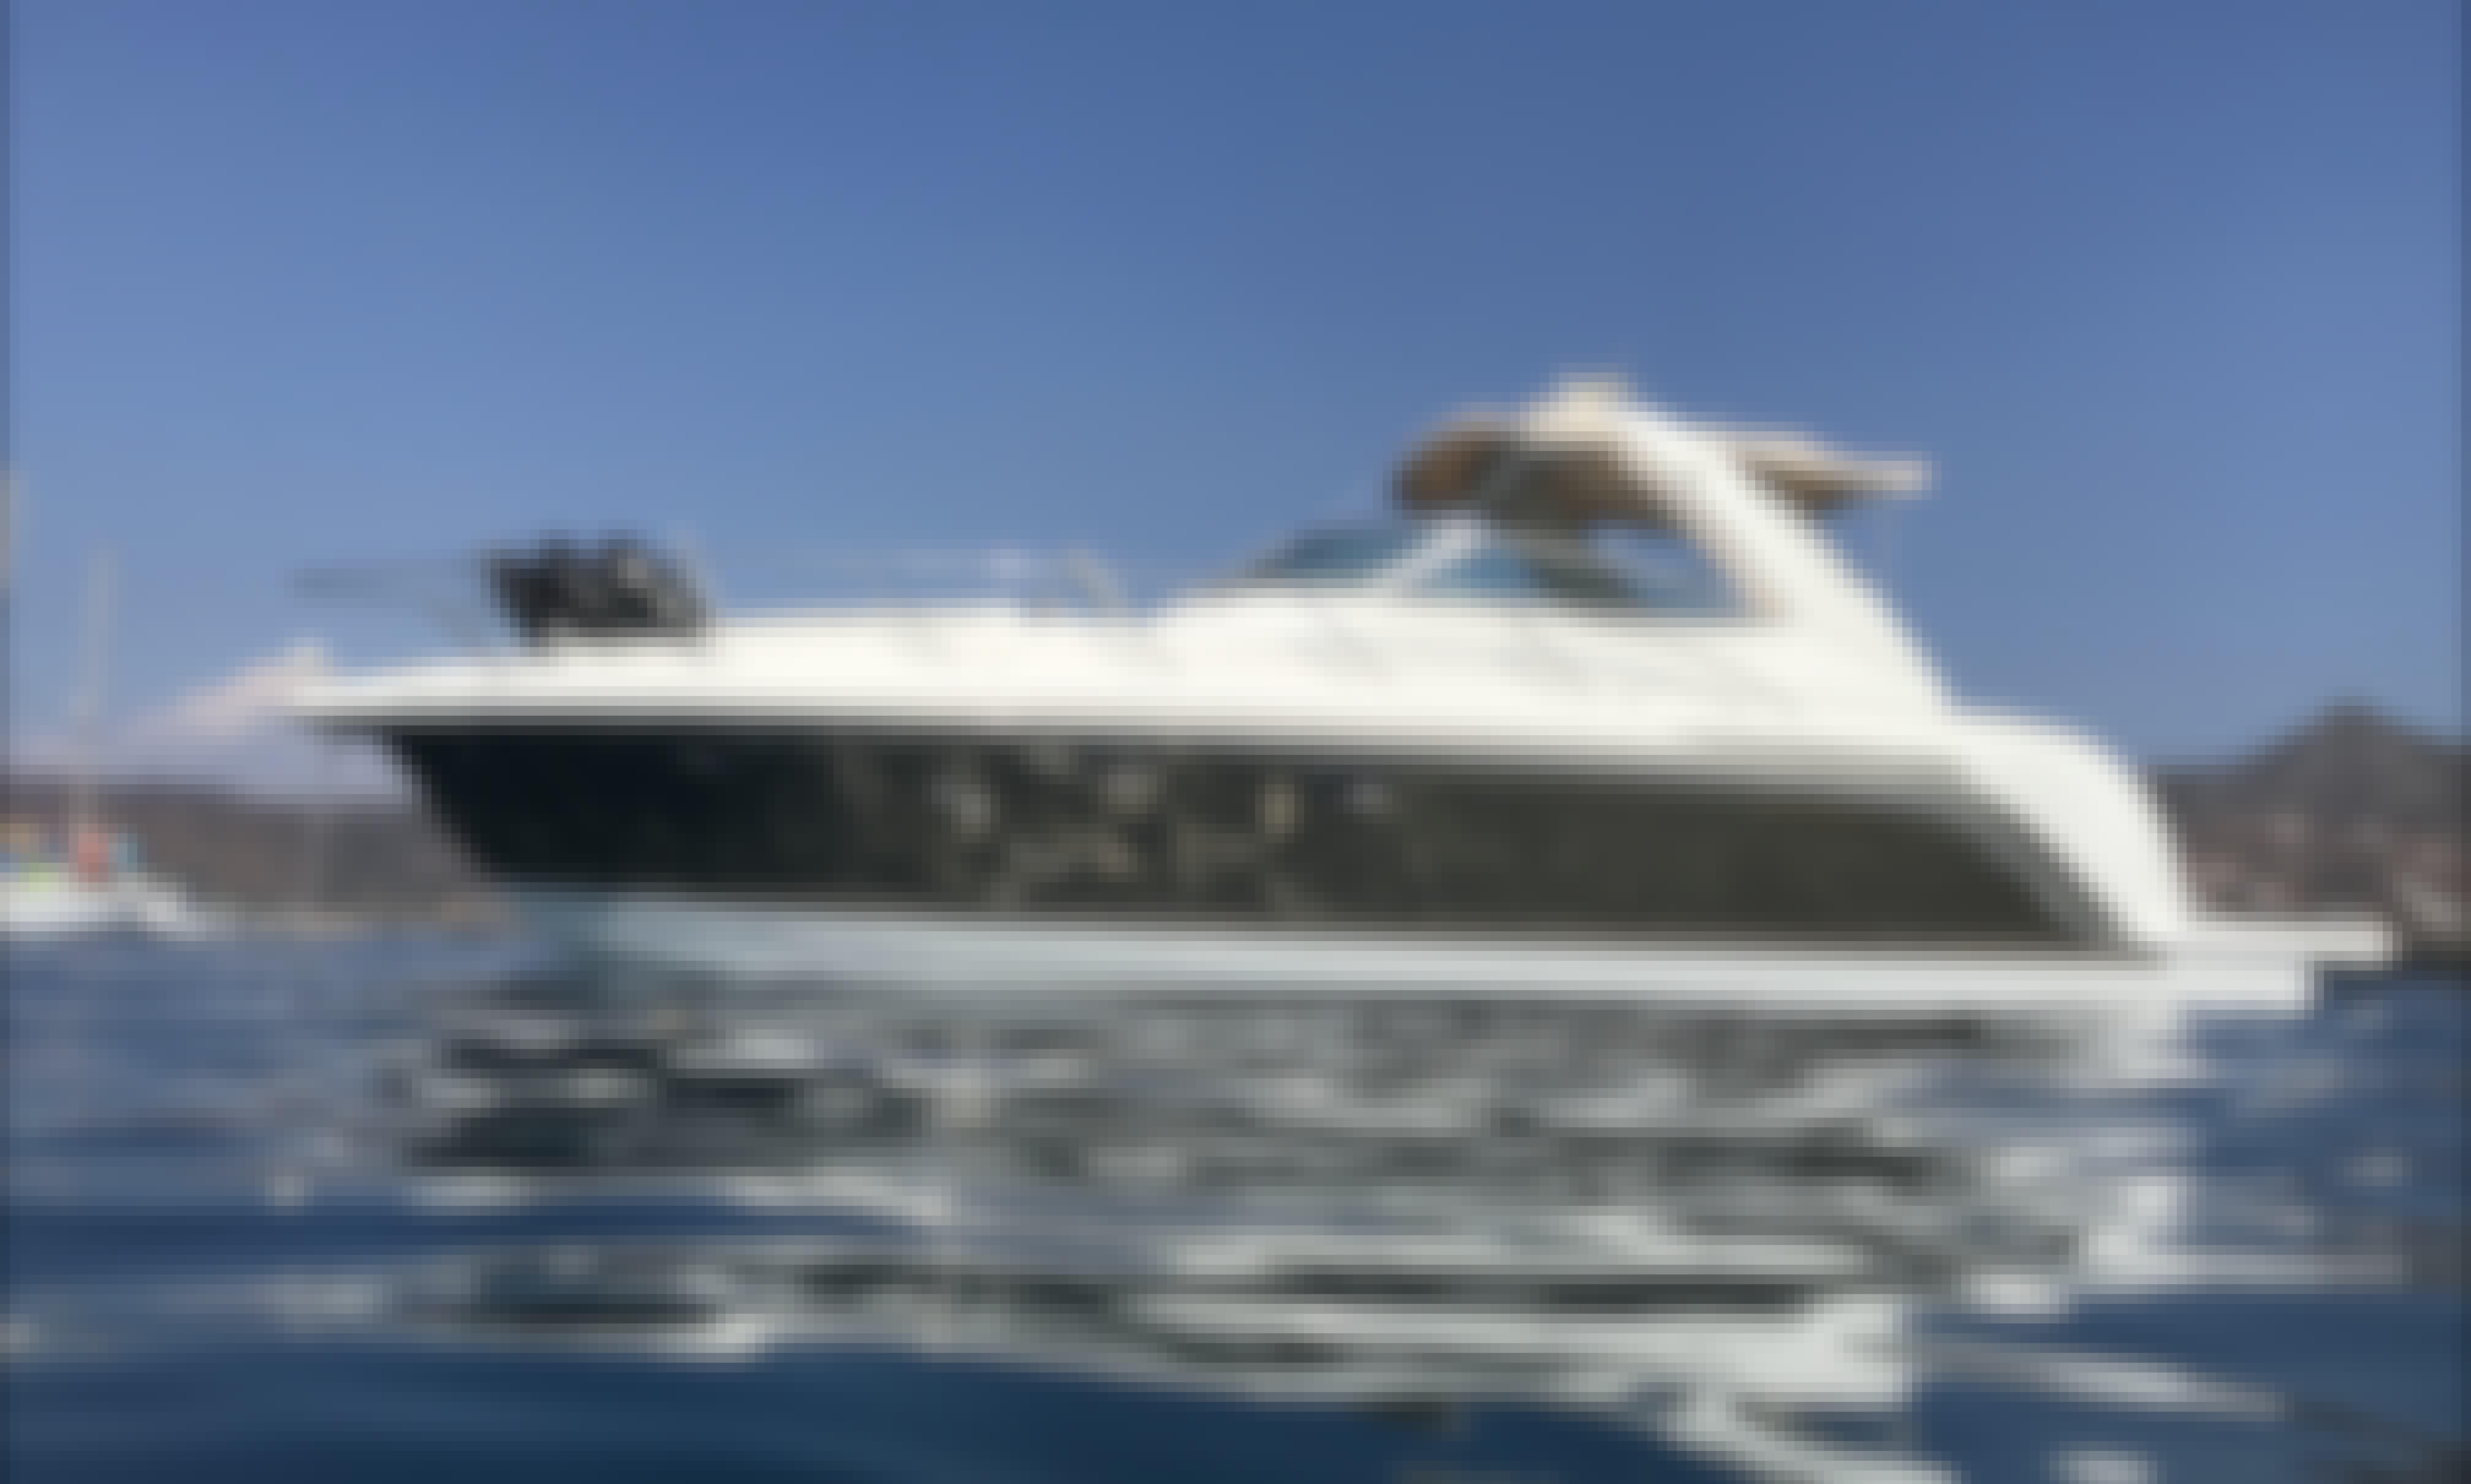 Formula 34 PC in Athens (Paleo Faliro) One/half day cruises & more